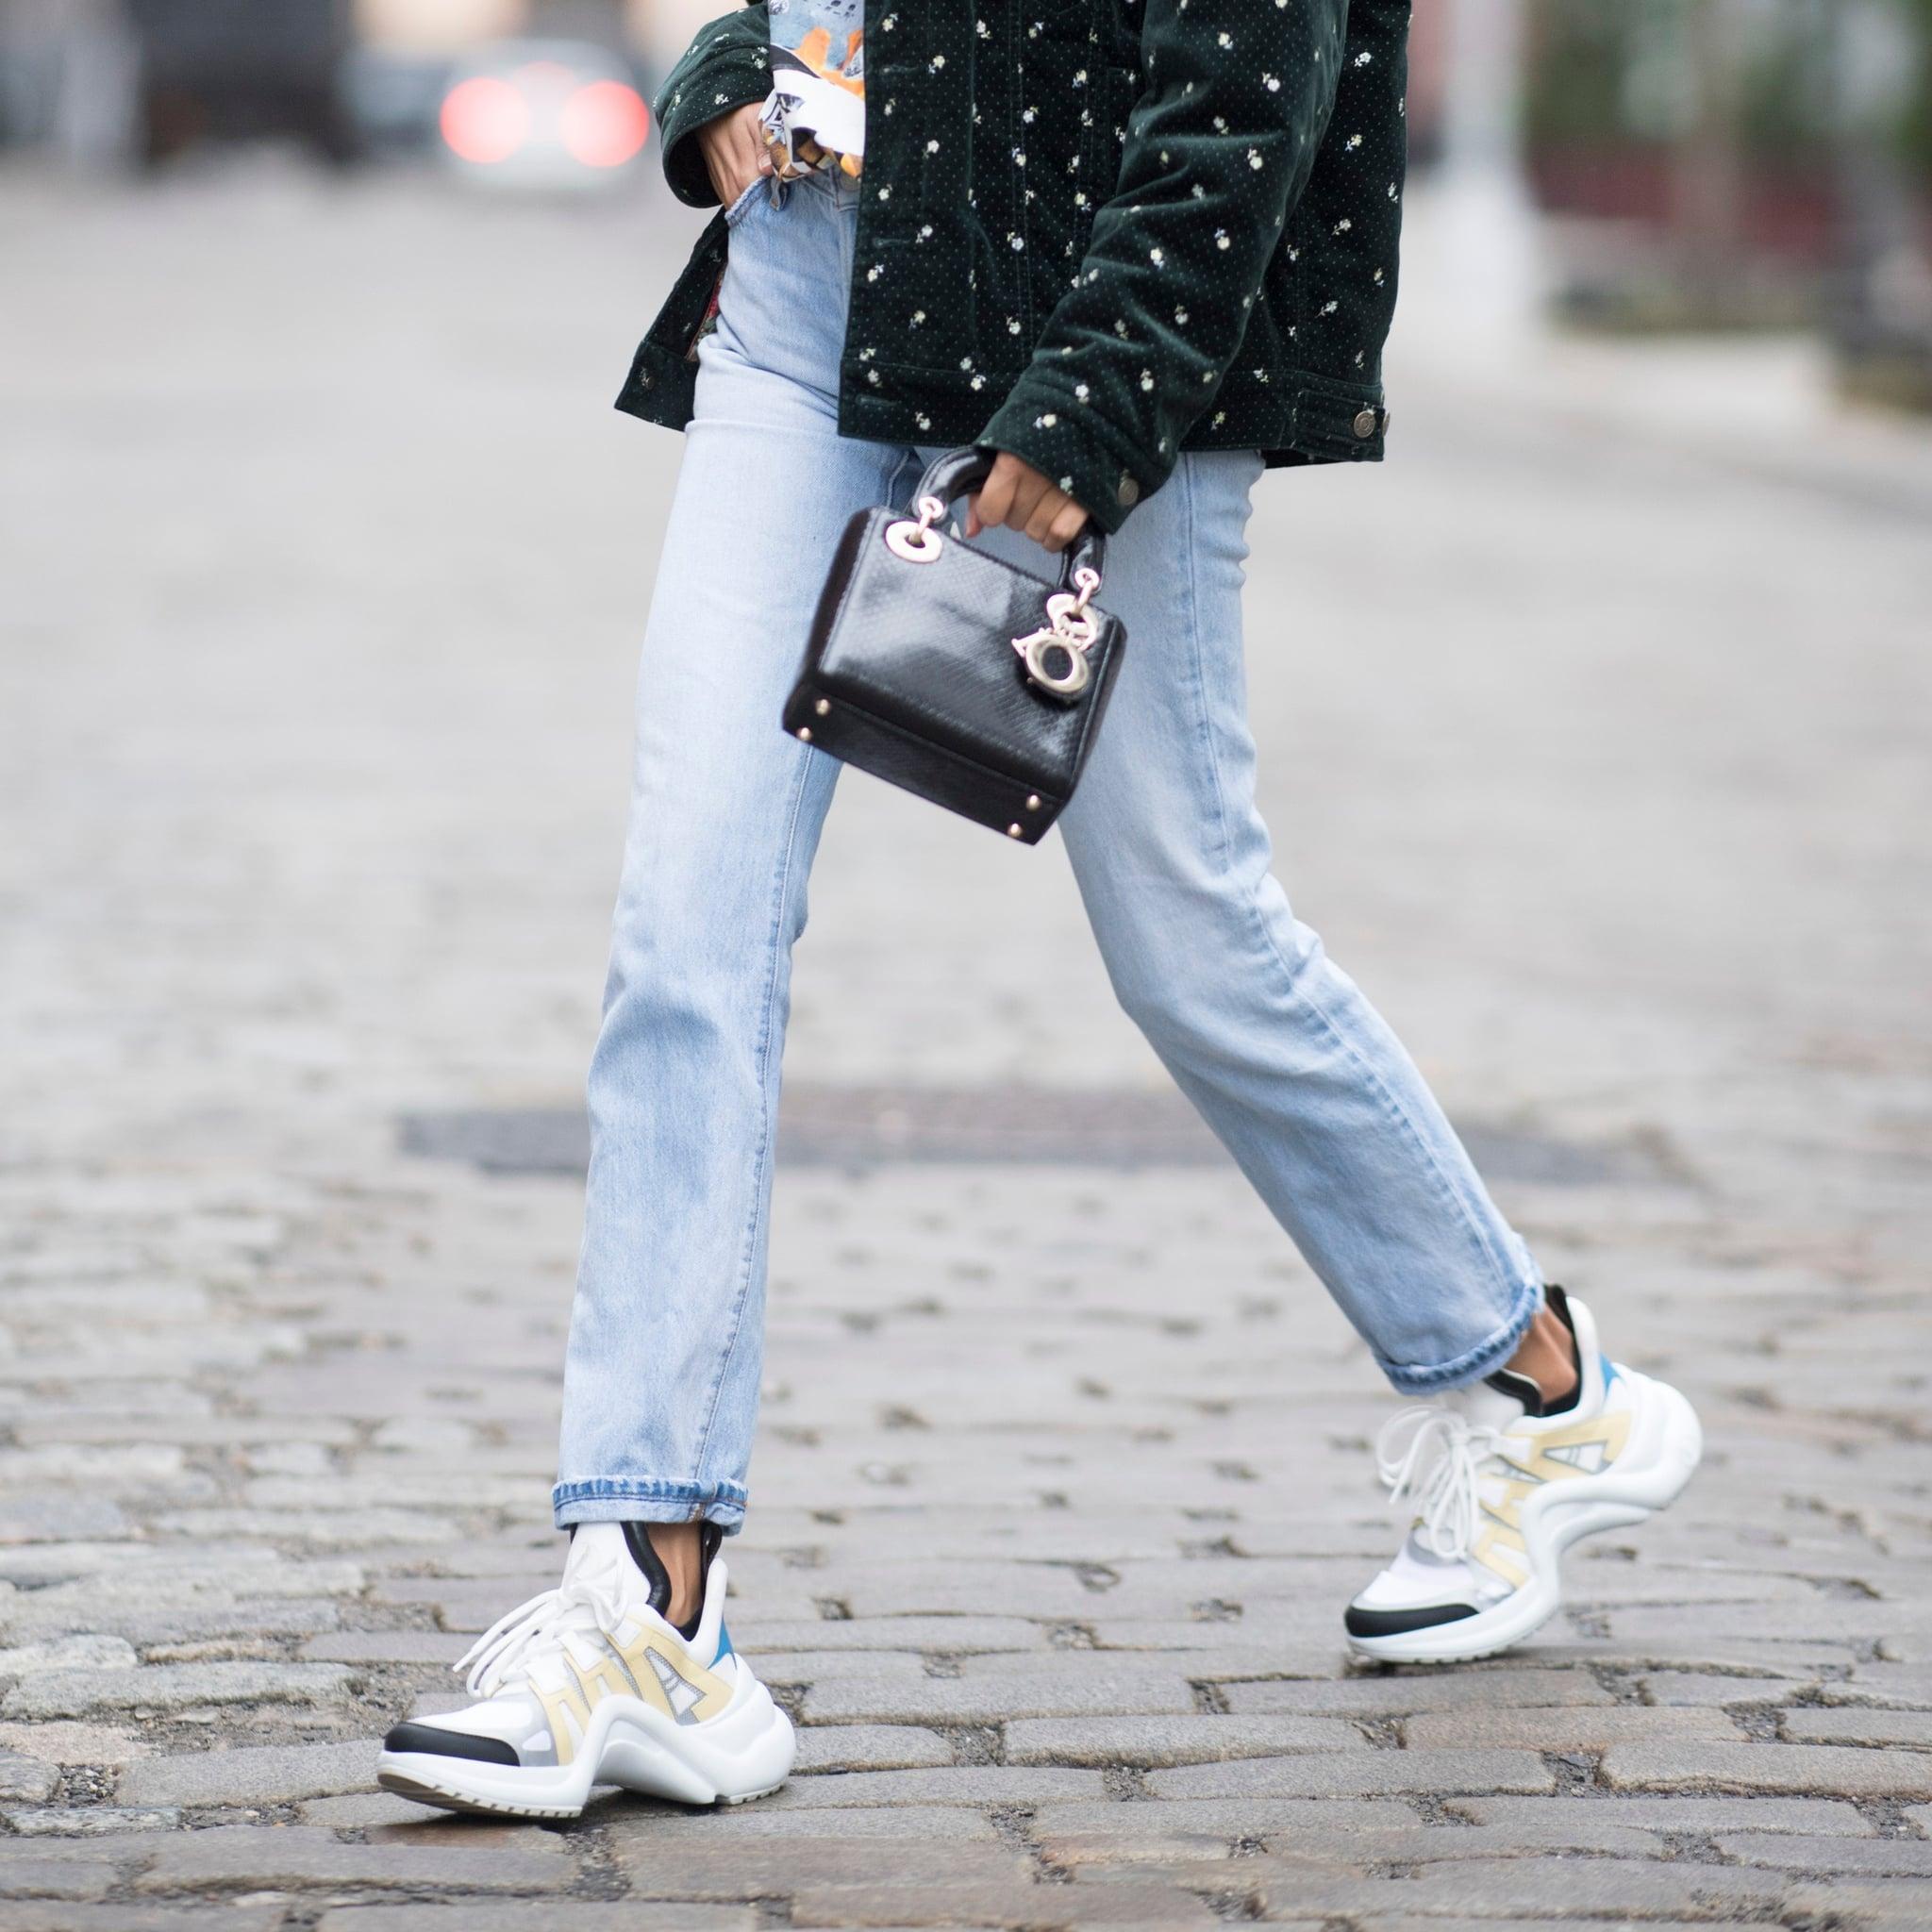 Cute Dad Sneakers 2018 | POPSUGAR Fashion